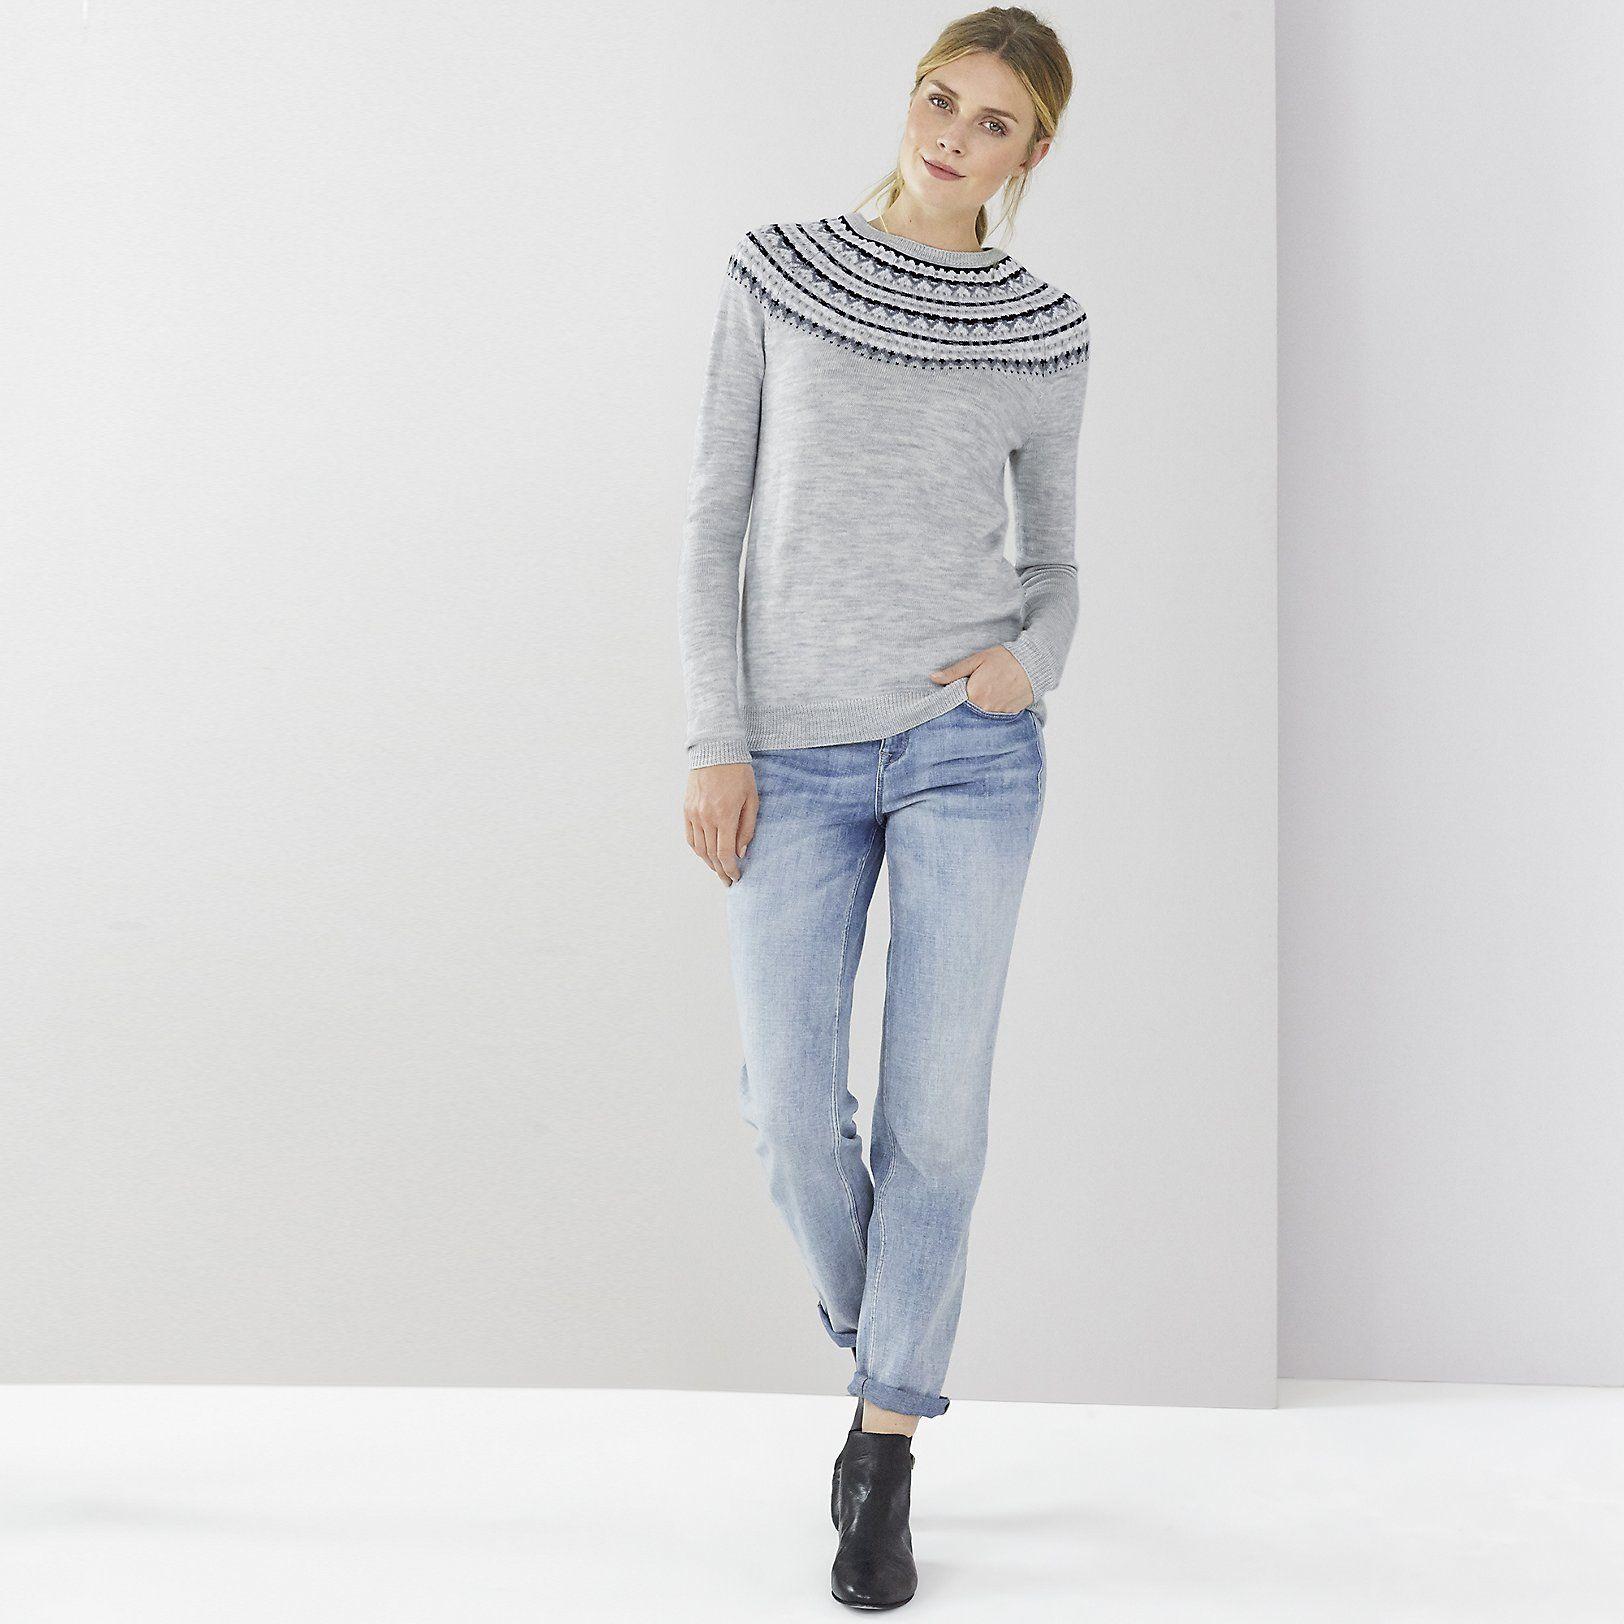 Fairisle Jumper   Jumpers   Knitwear   Clothing   The White Company UK